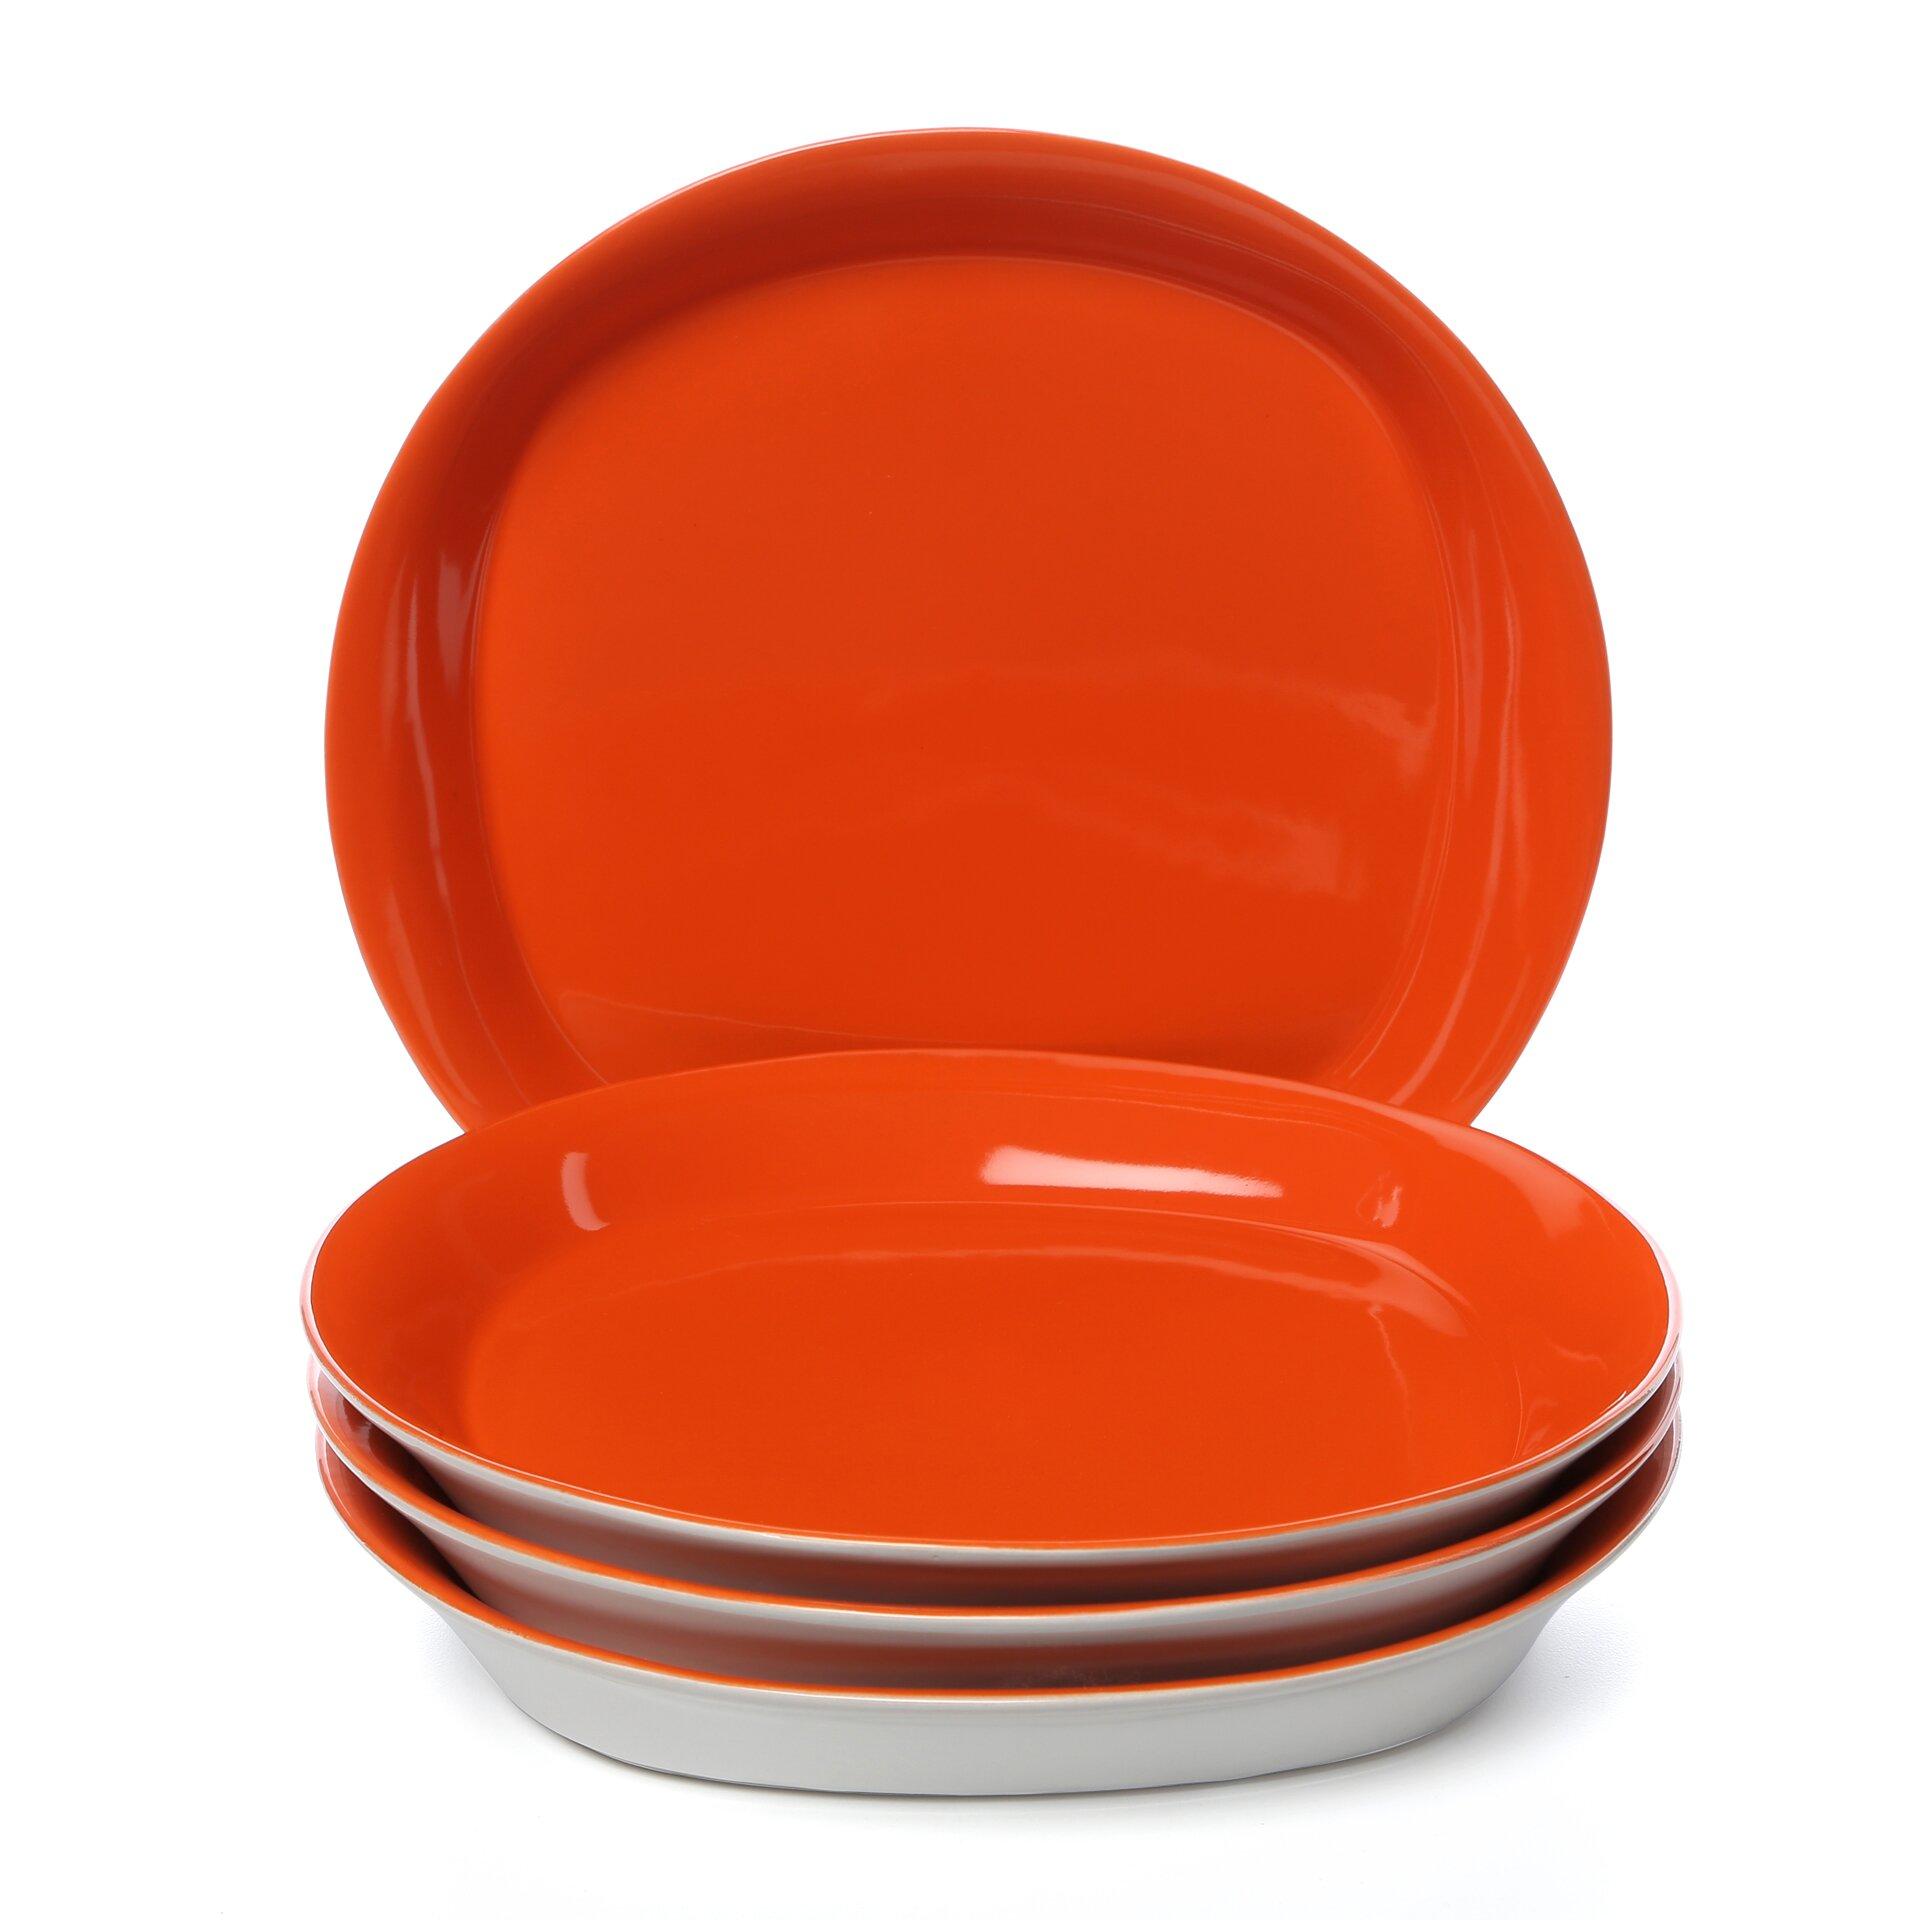 round square 11 dinner plate 4 piece set wayfair. Black Bedroom Furniture Sets. Home Design Ideas